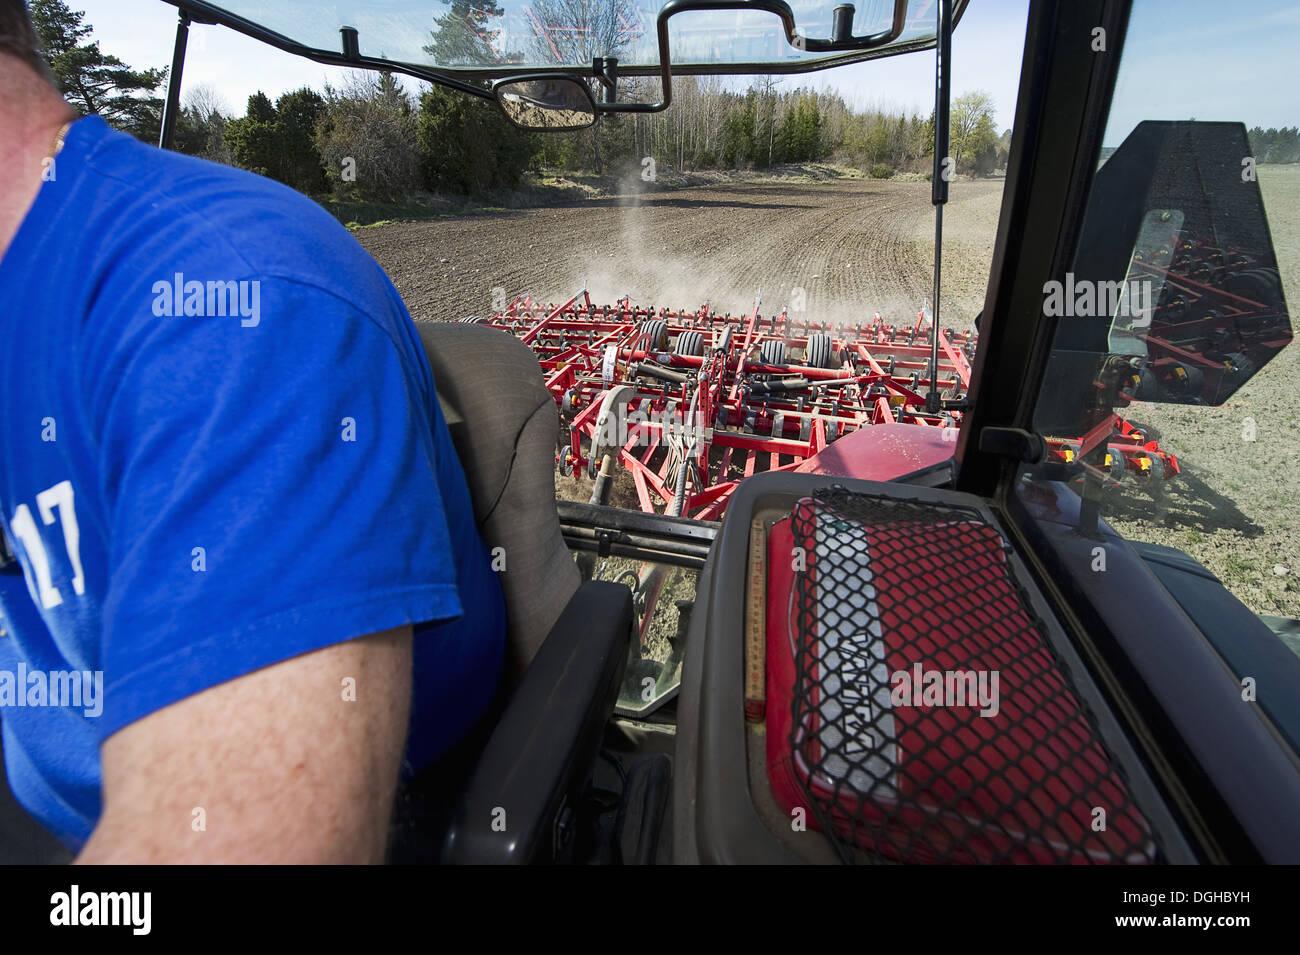 Interior of Case MXM 155 tractor cab with Vaderstad NZ-Aggressive-700 harrows, harrowing arable field, Sweden, may. - Stock Image